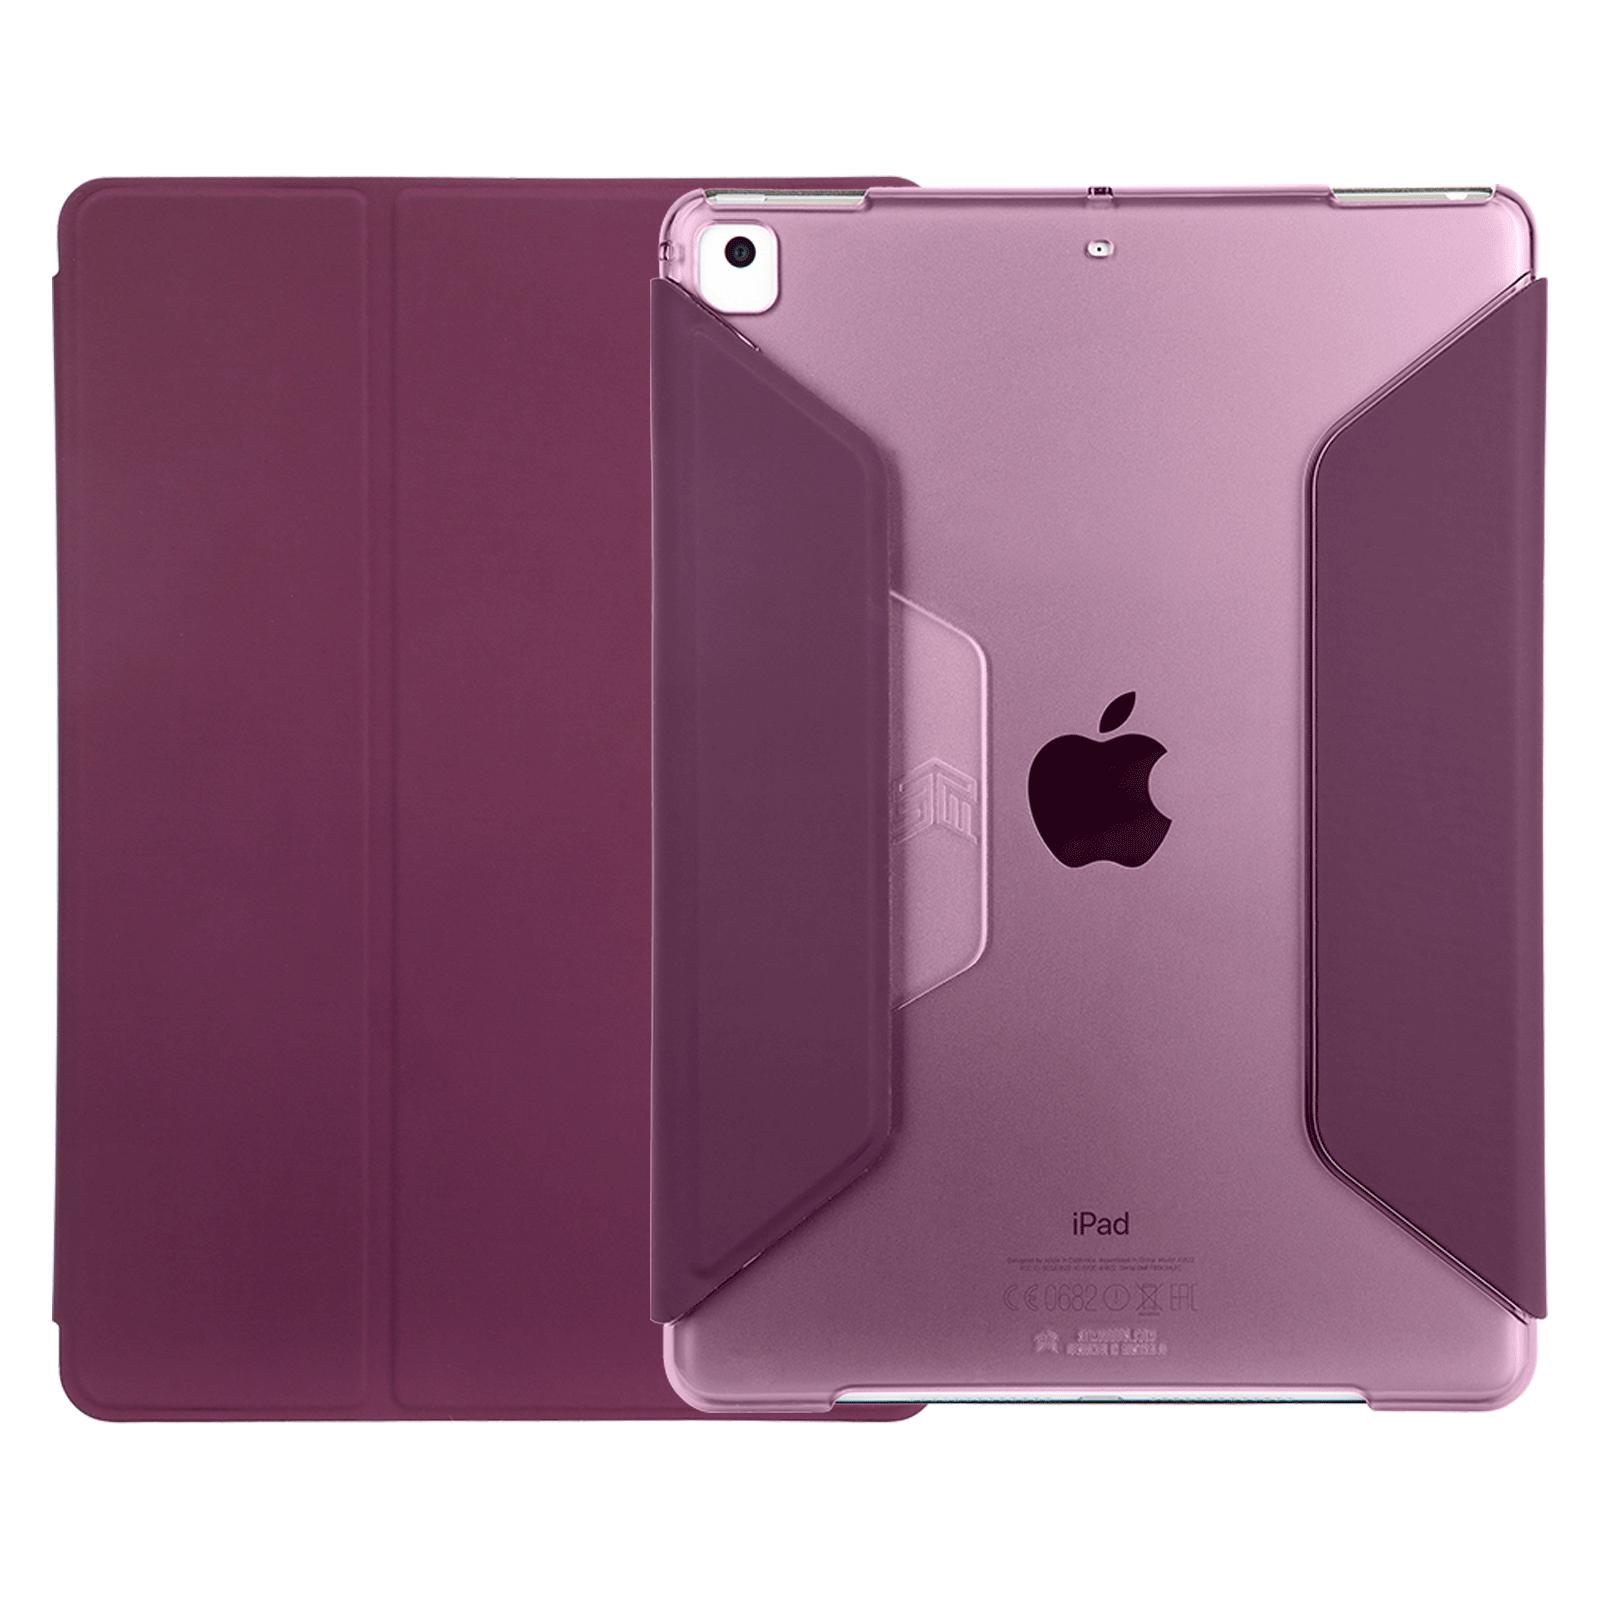 STM Studio Polycarbonate, Polyurethane Flip Case For iPad Mini 4th/5th Gen (Multiple Viewing Modes, STM-222-161GY-02, Purple)_1